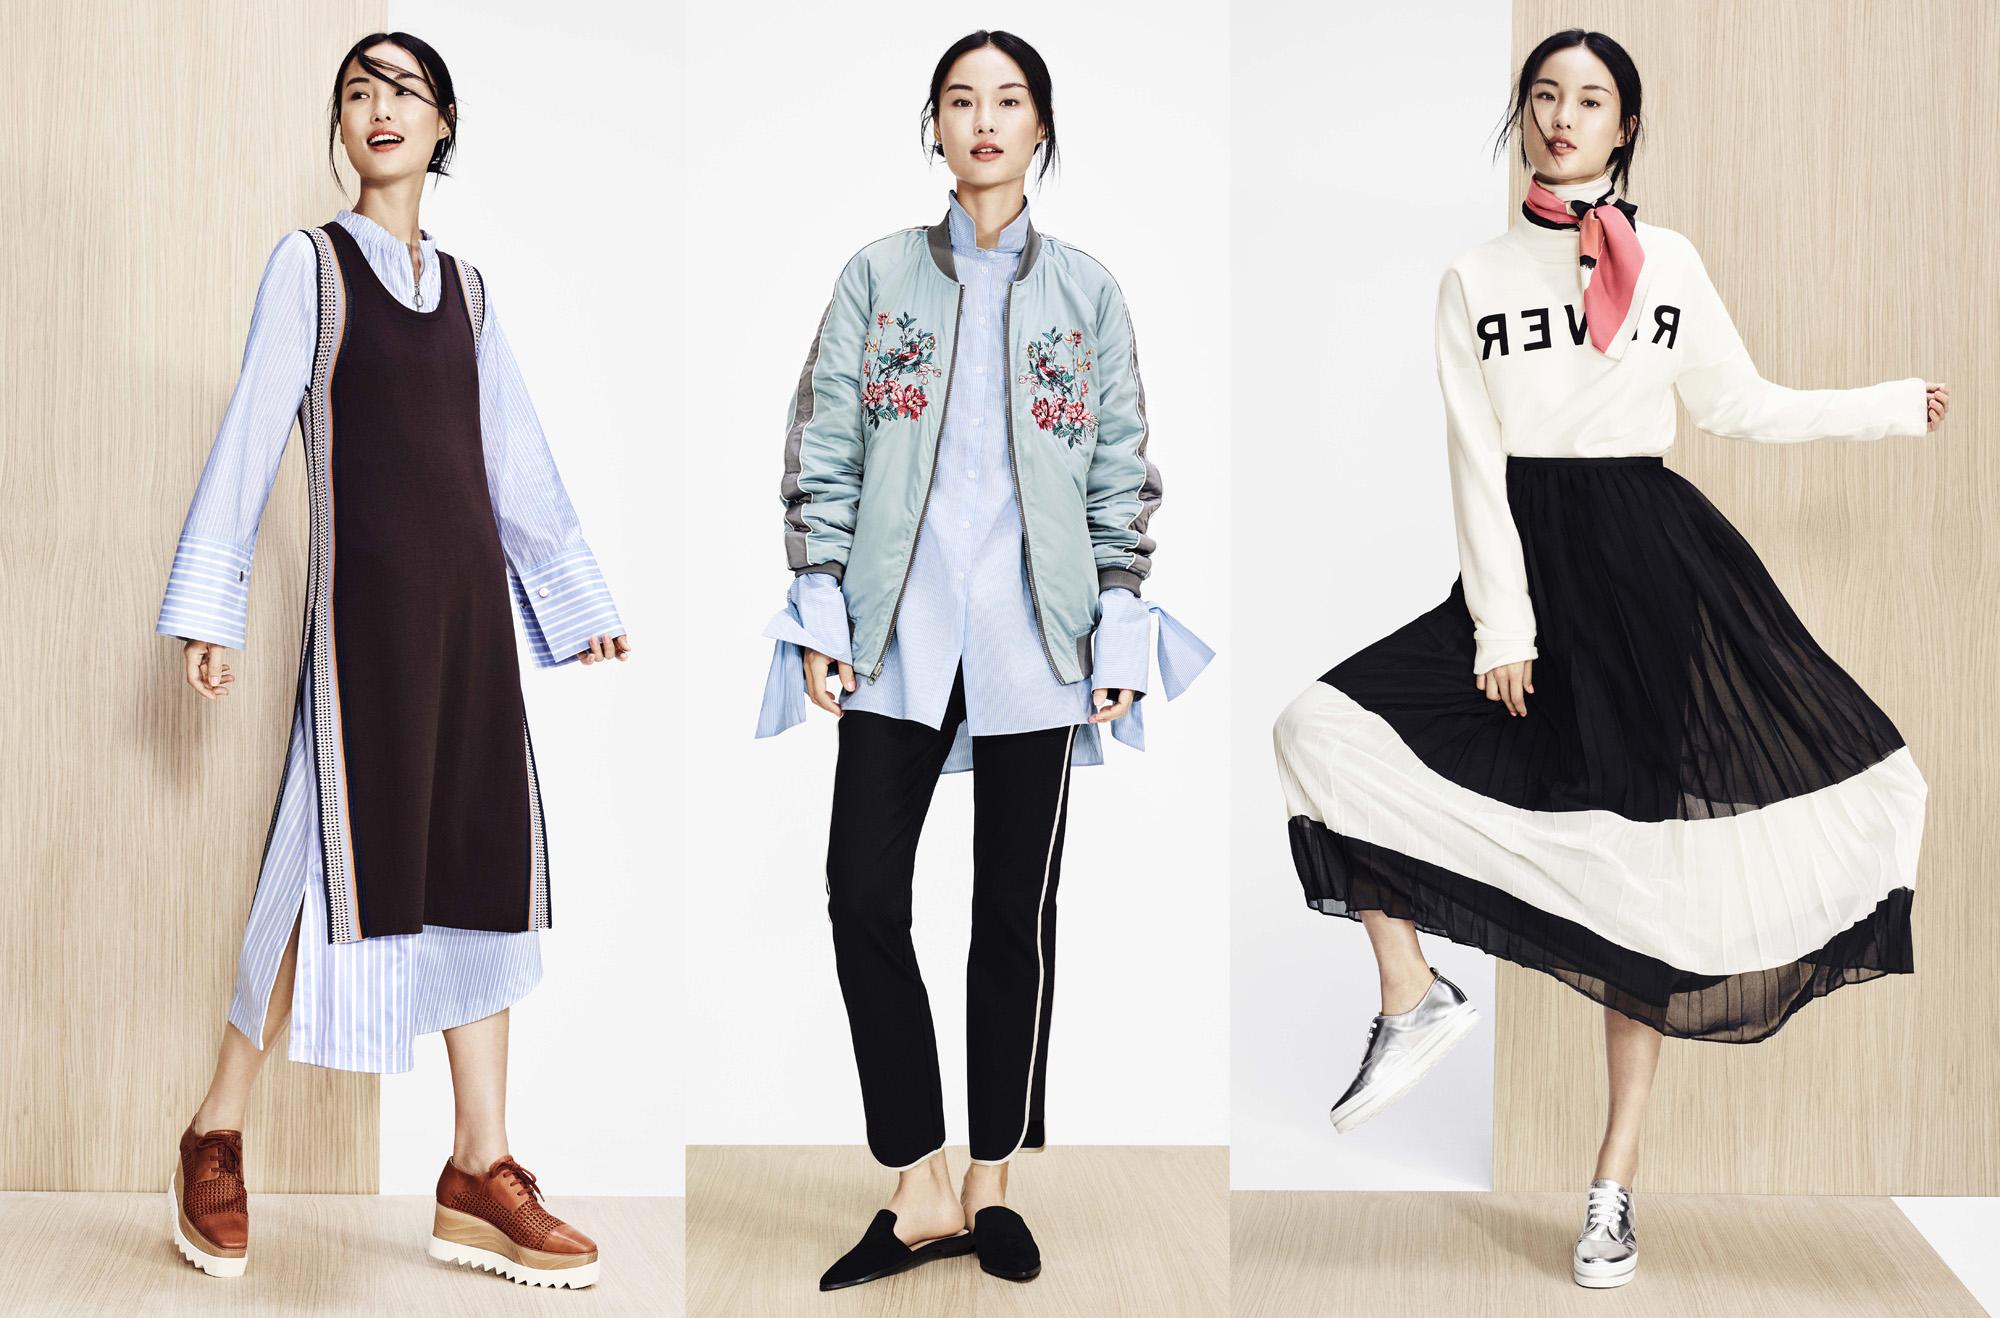 Fashion lookbook 2017 - Lindex Lookbook Ss17